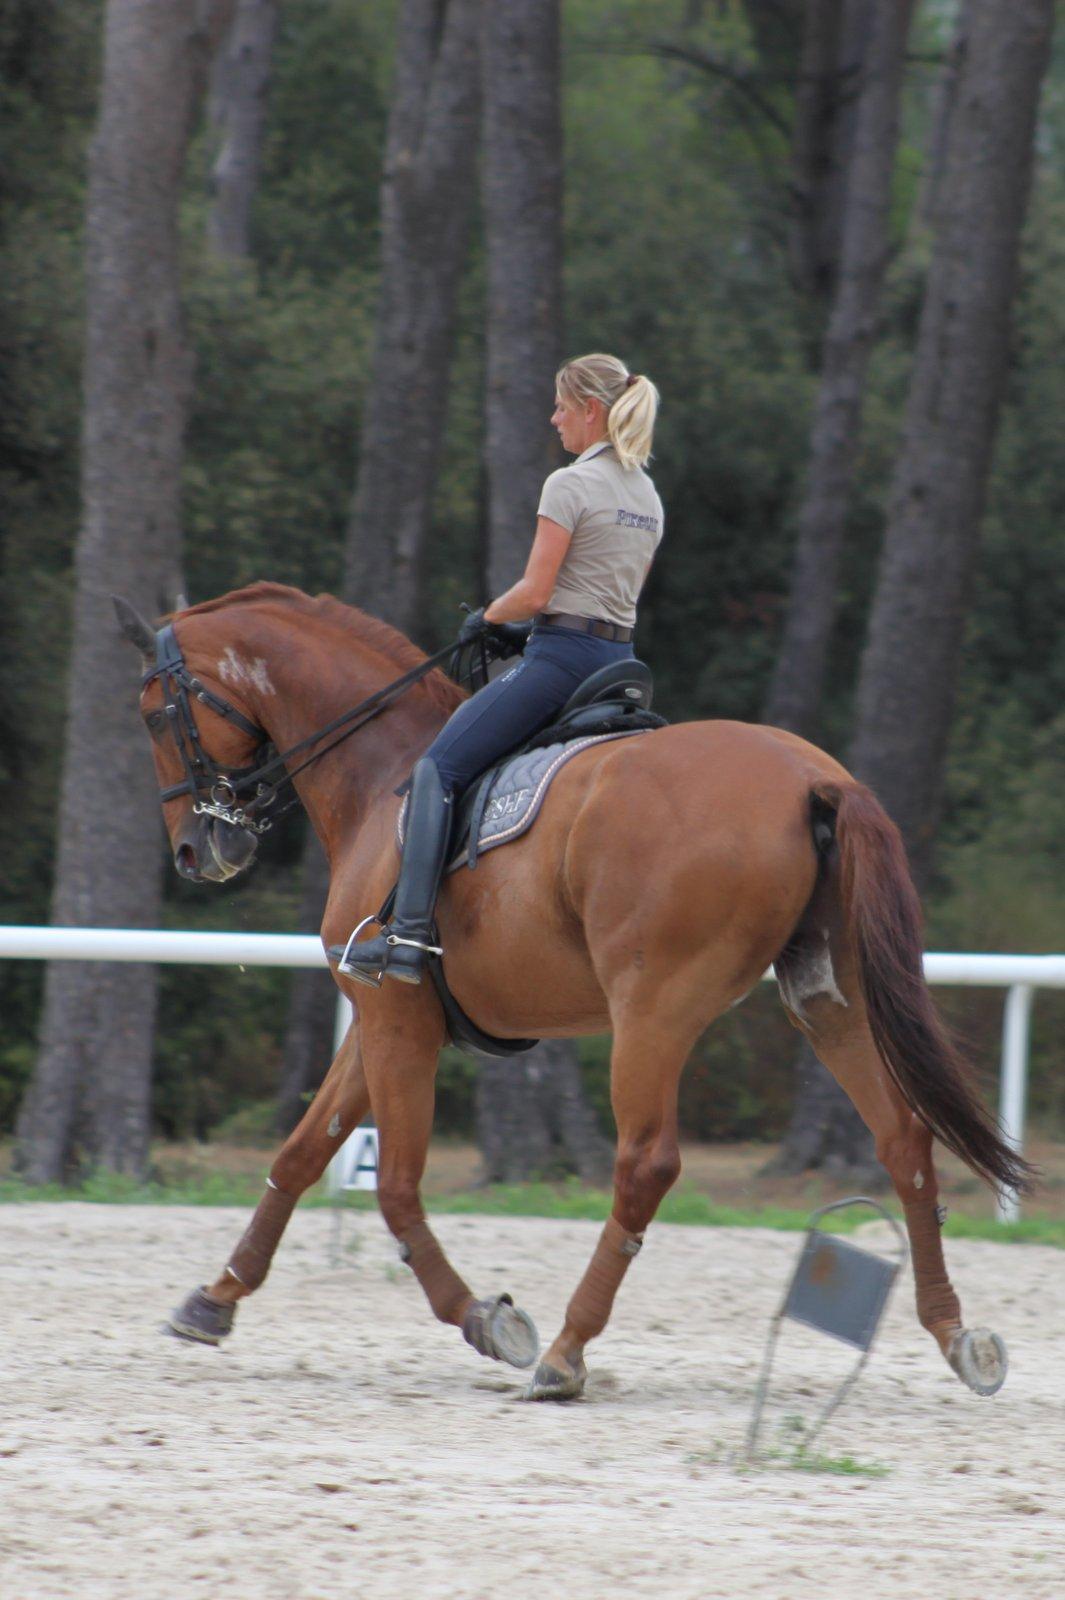 isabelle-pinto-cavaliere-de-grand-prix-po%cc%82le-equestre-carlos-pinto-aix-en-provence-marseille-13